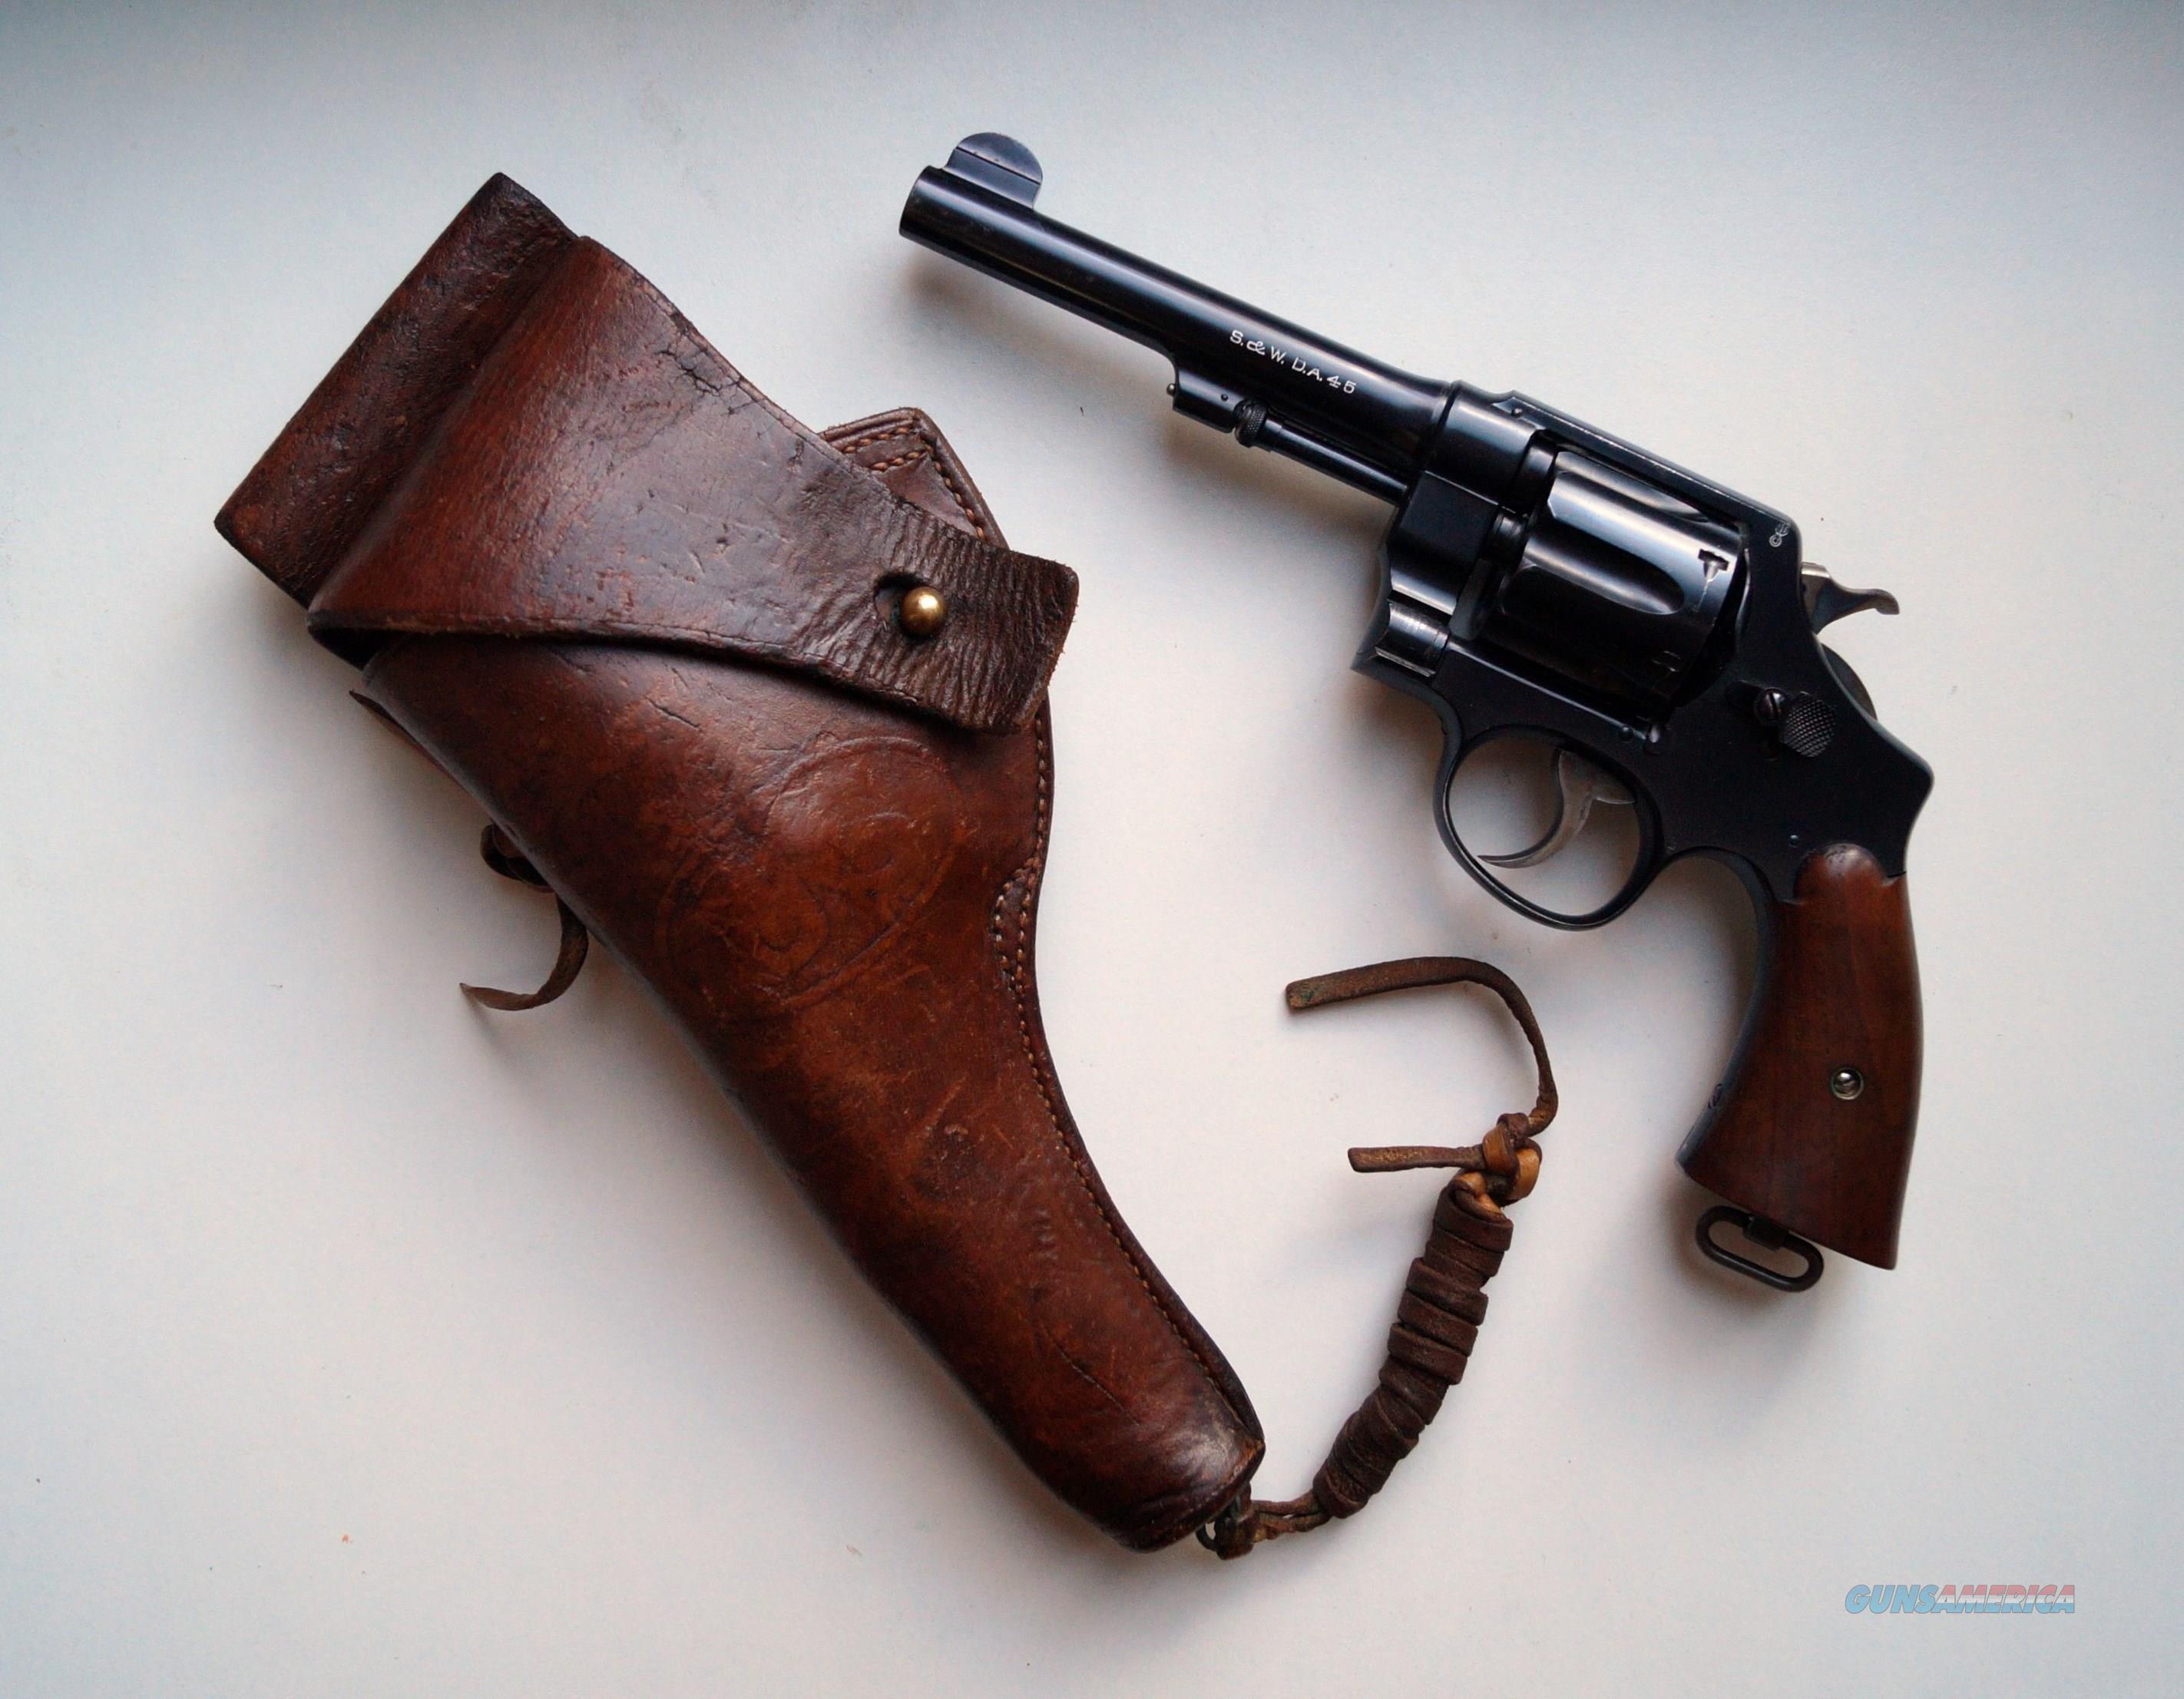 SMITH & WESSON MODEL 1917 U.S. ARMY REVOLVER / .45 CAL WITH ORIGINAL HOLSTER  Guns > Pistols > Smith & Wesson Revolvers > Pre-1945